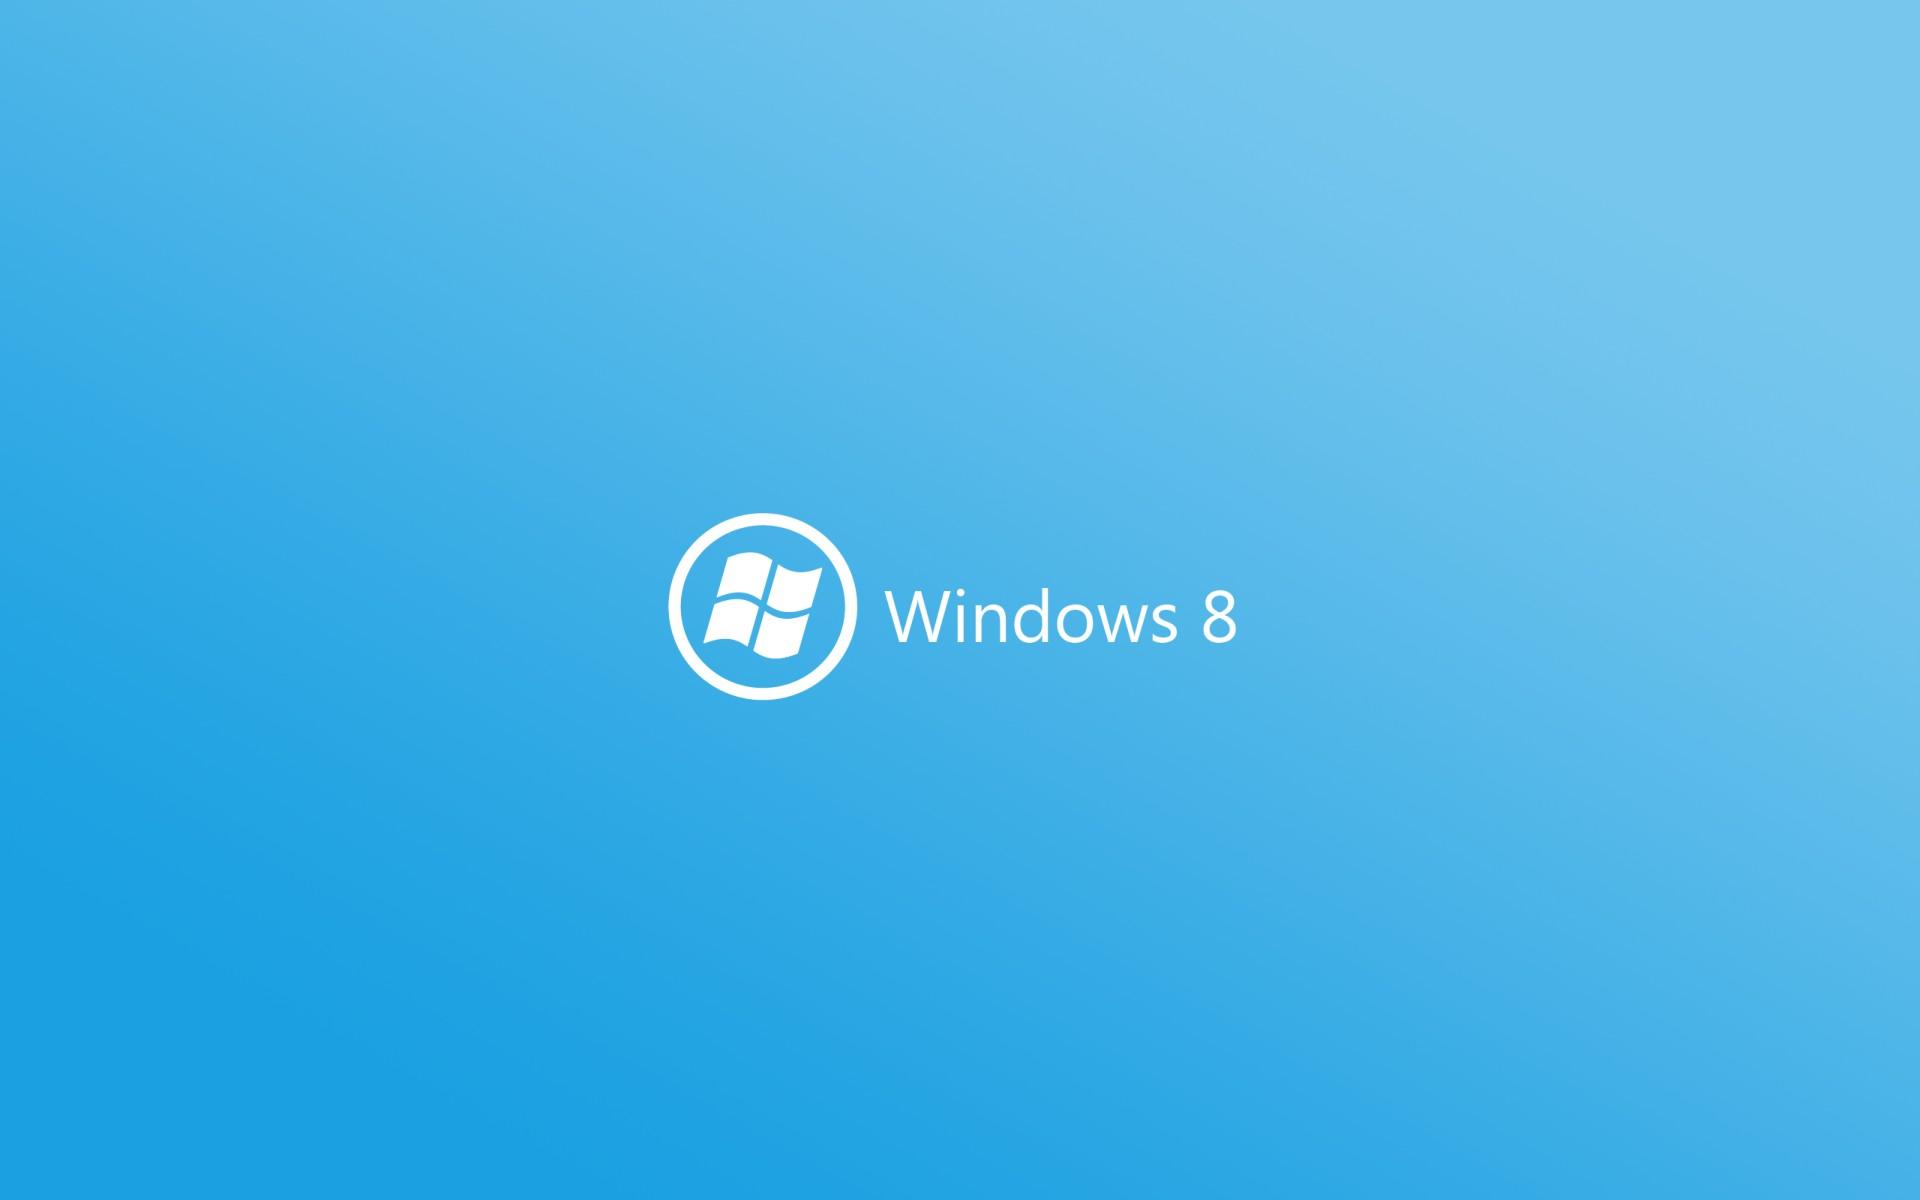 wallpaper windows logo colors background blue iuzdtz6z4su 1920x1200